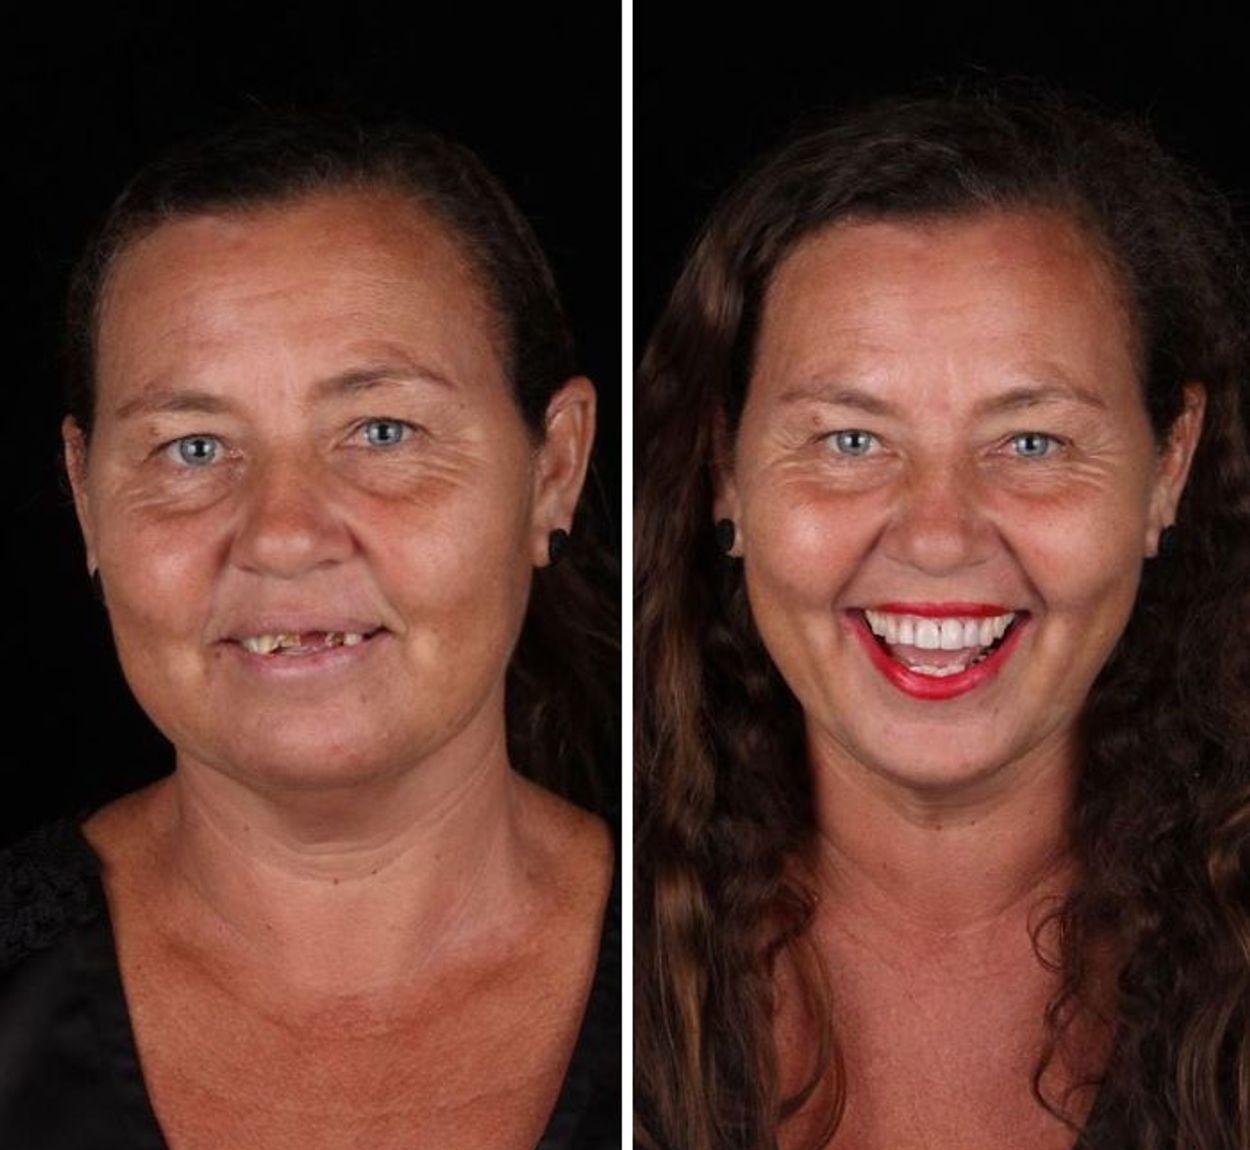 brazilian-dentist-travel-poor-people-teeth-fix-felipe-rossi-35-5db94ff6b6ab6__700